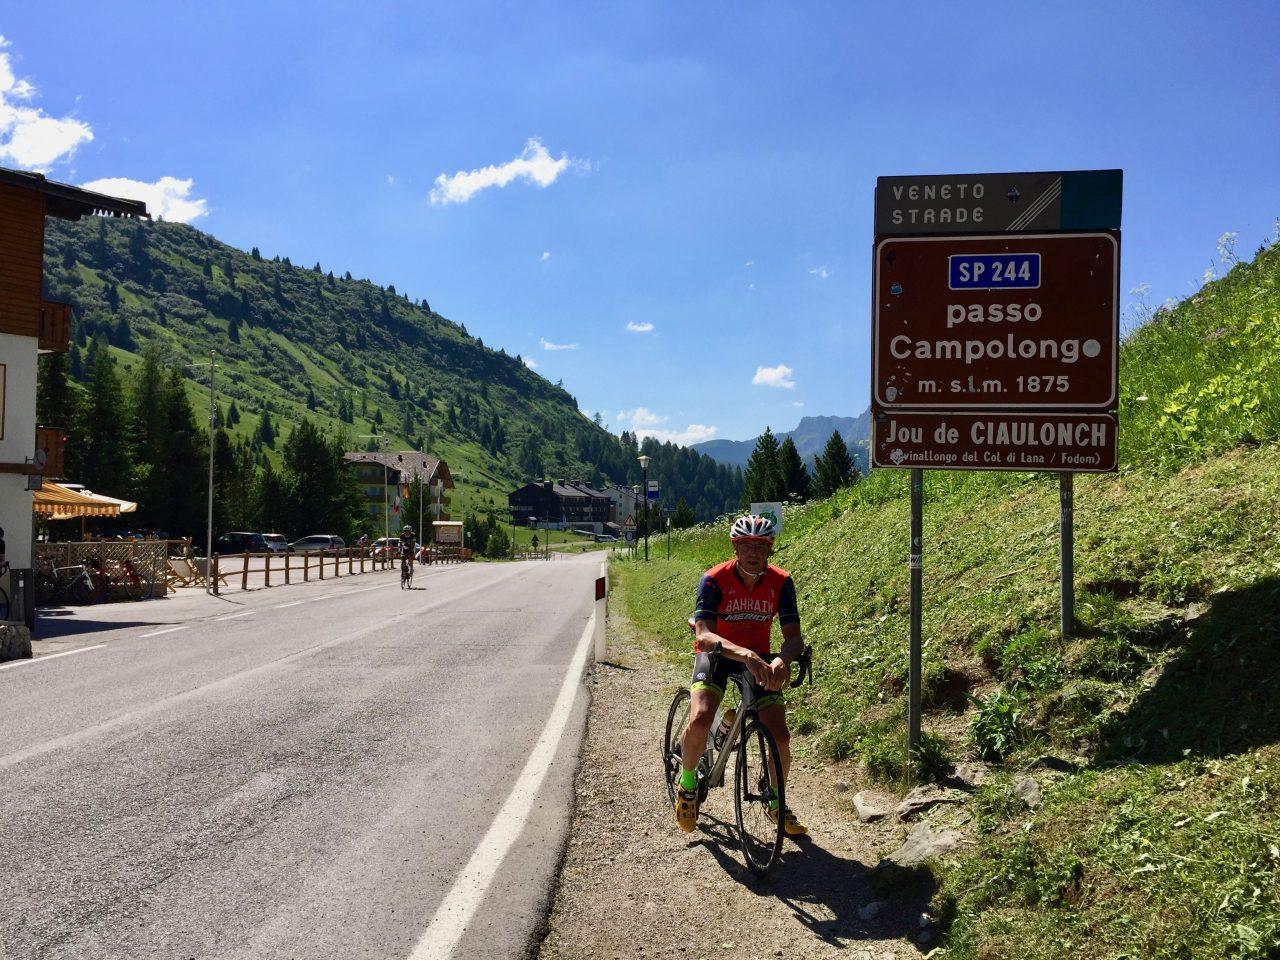 Martin, Passo Campolongo